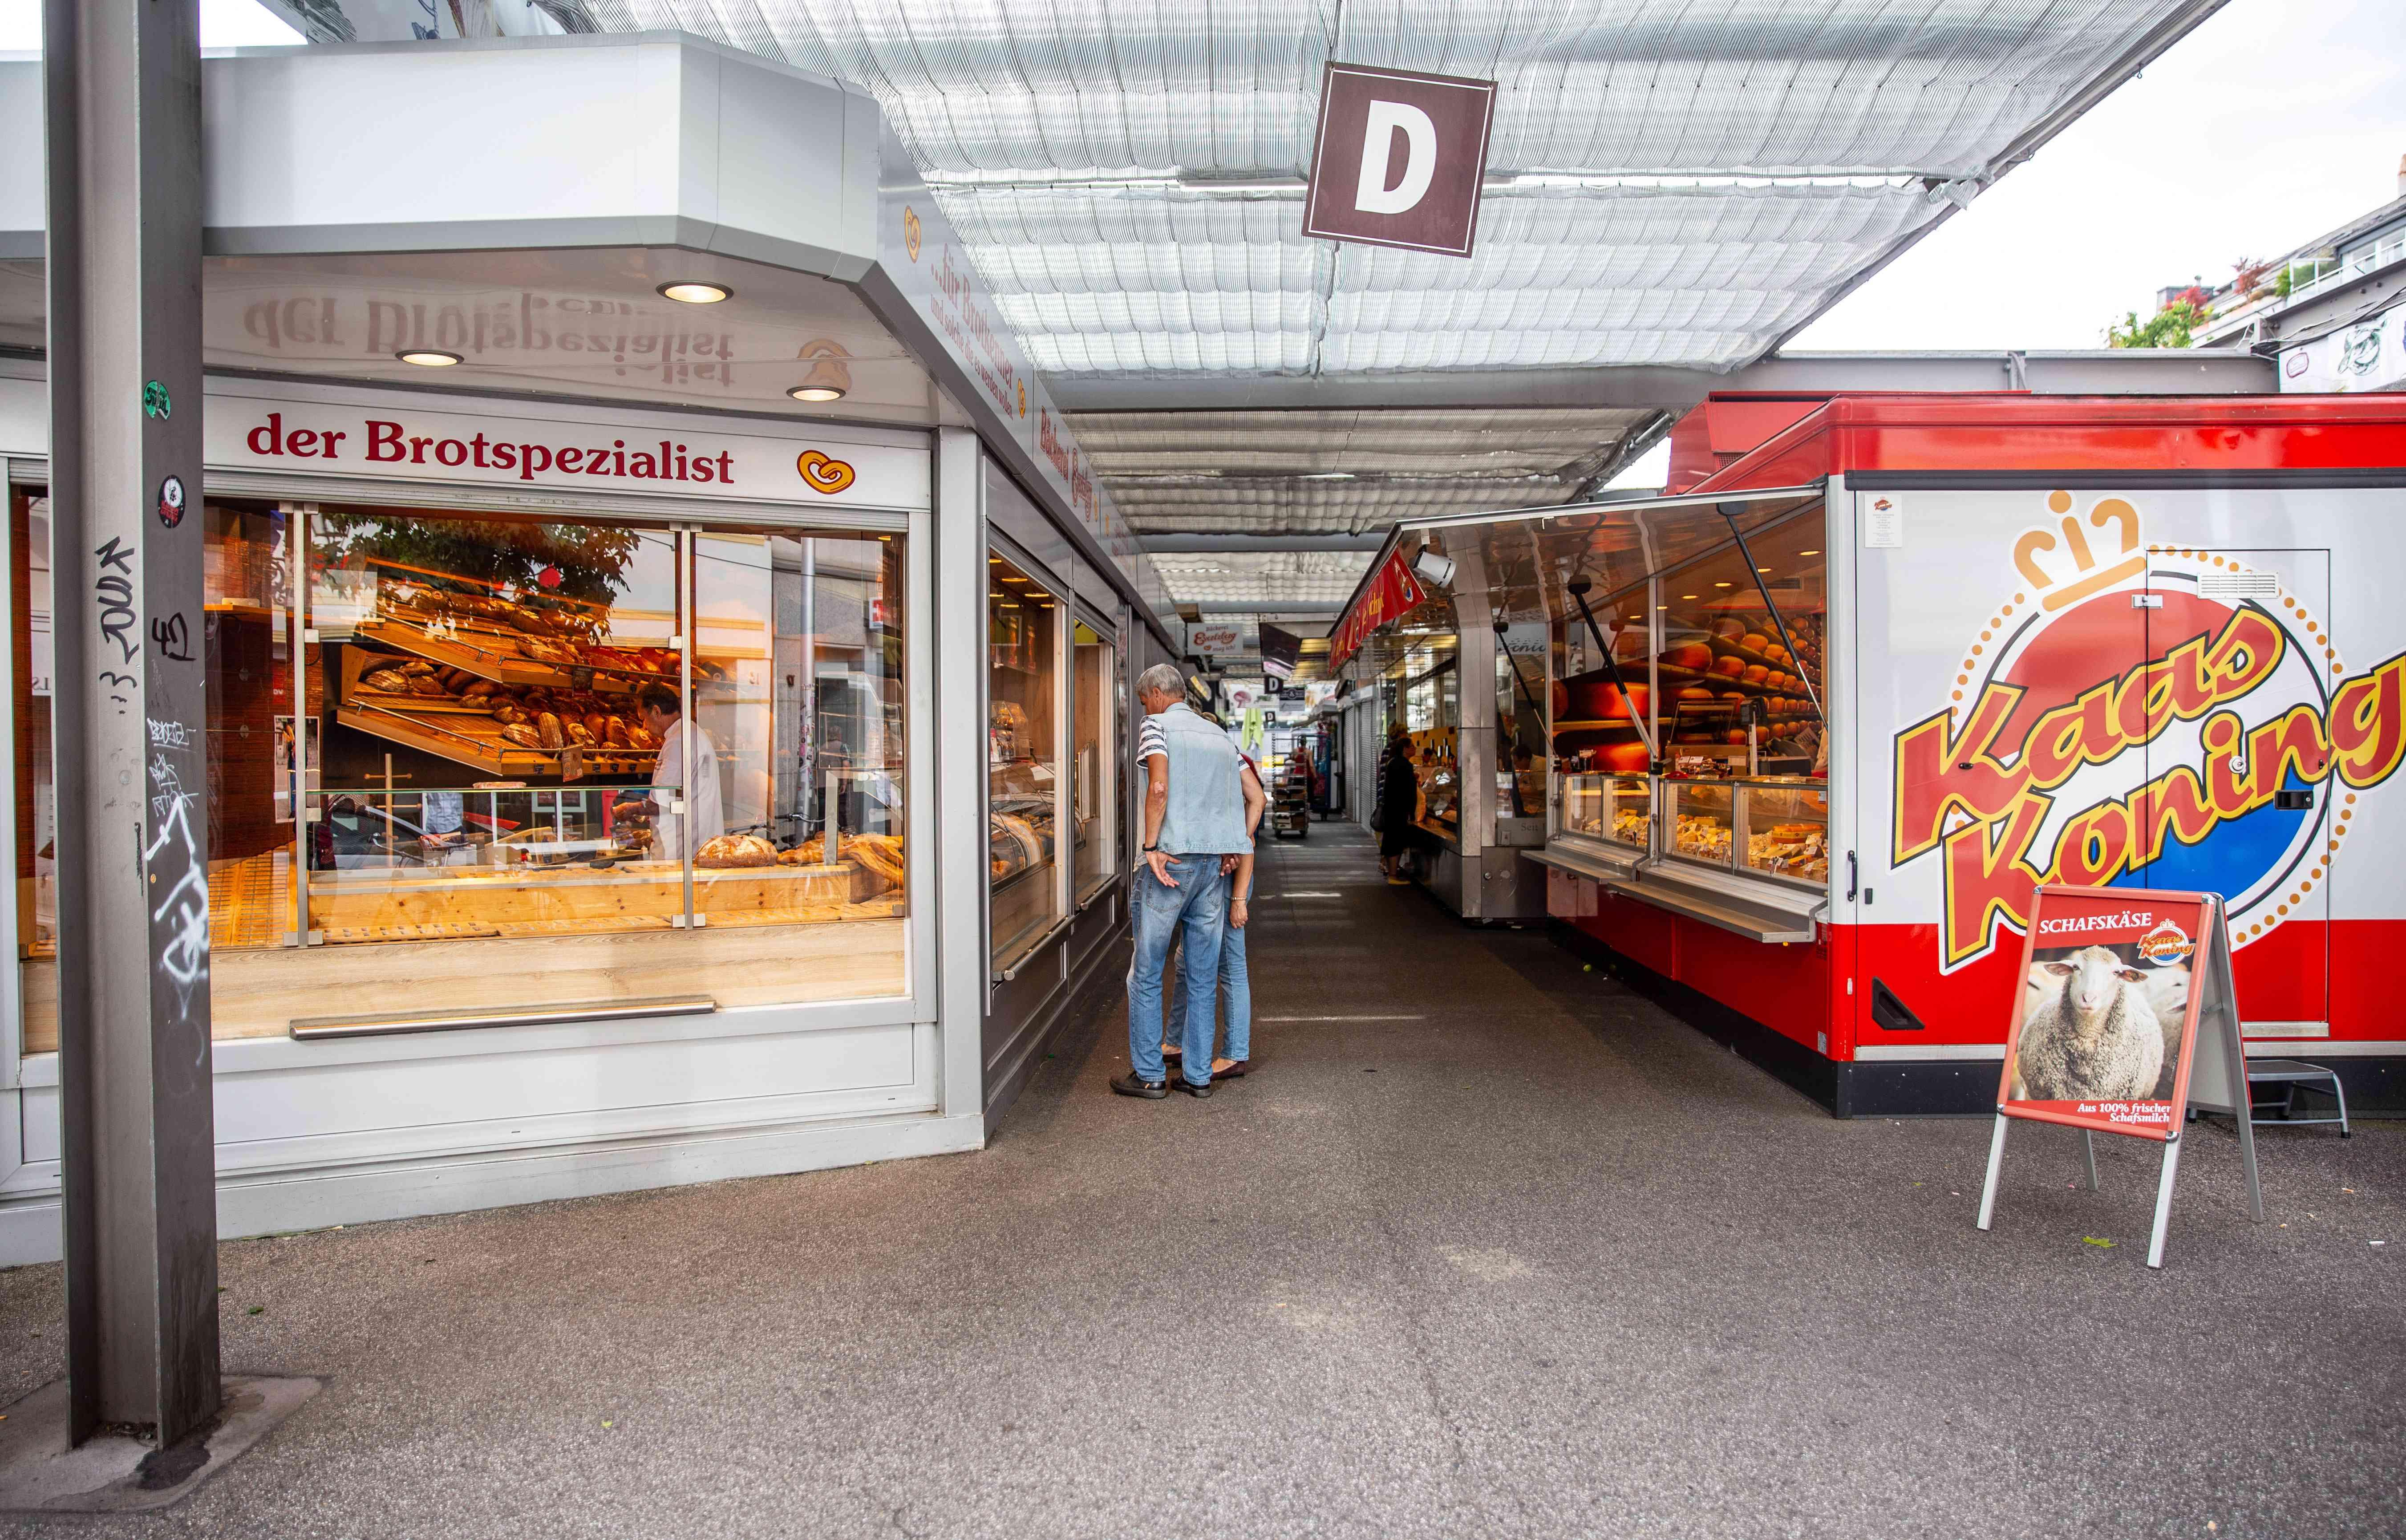 A man window shopping at Carlsplatz market